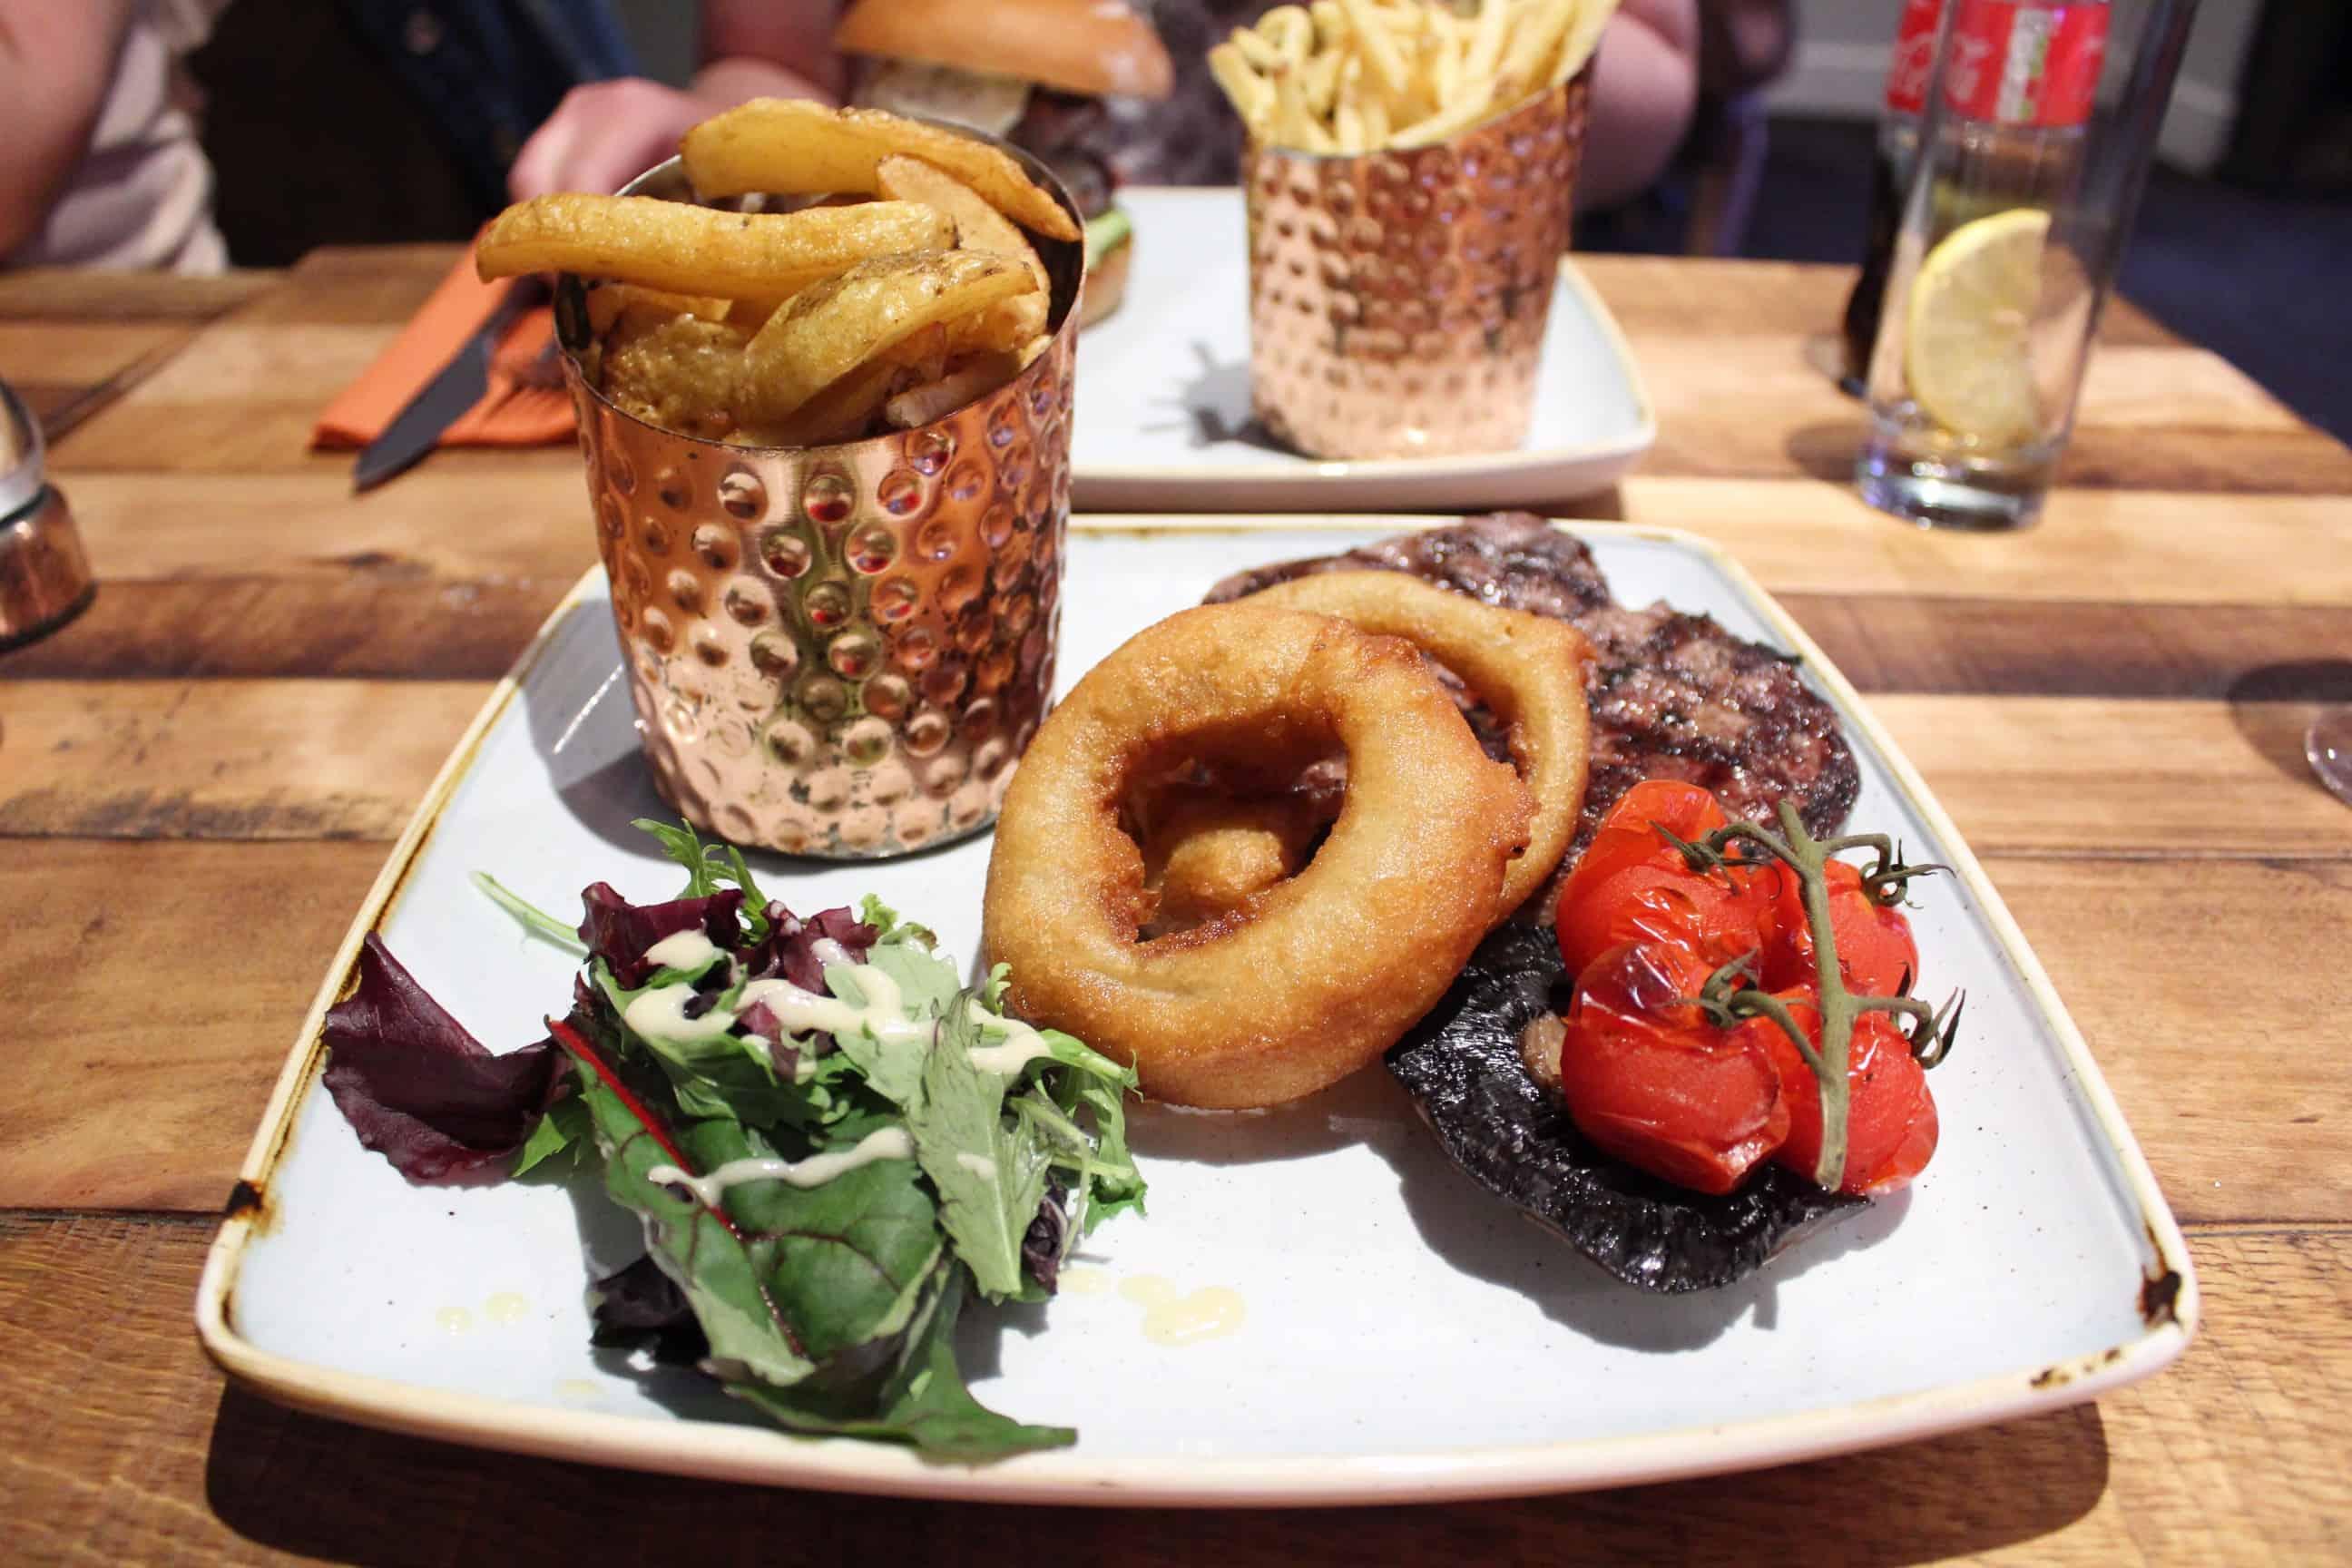 Steak at Stamford's Pocklington